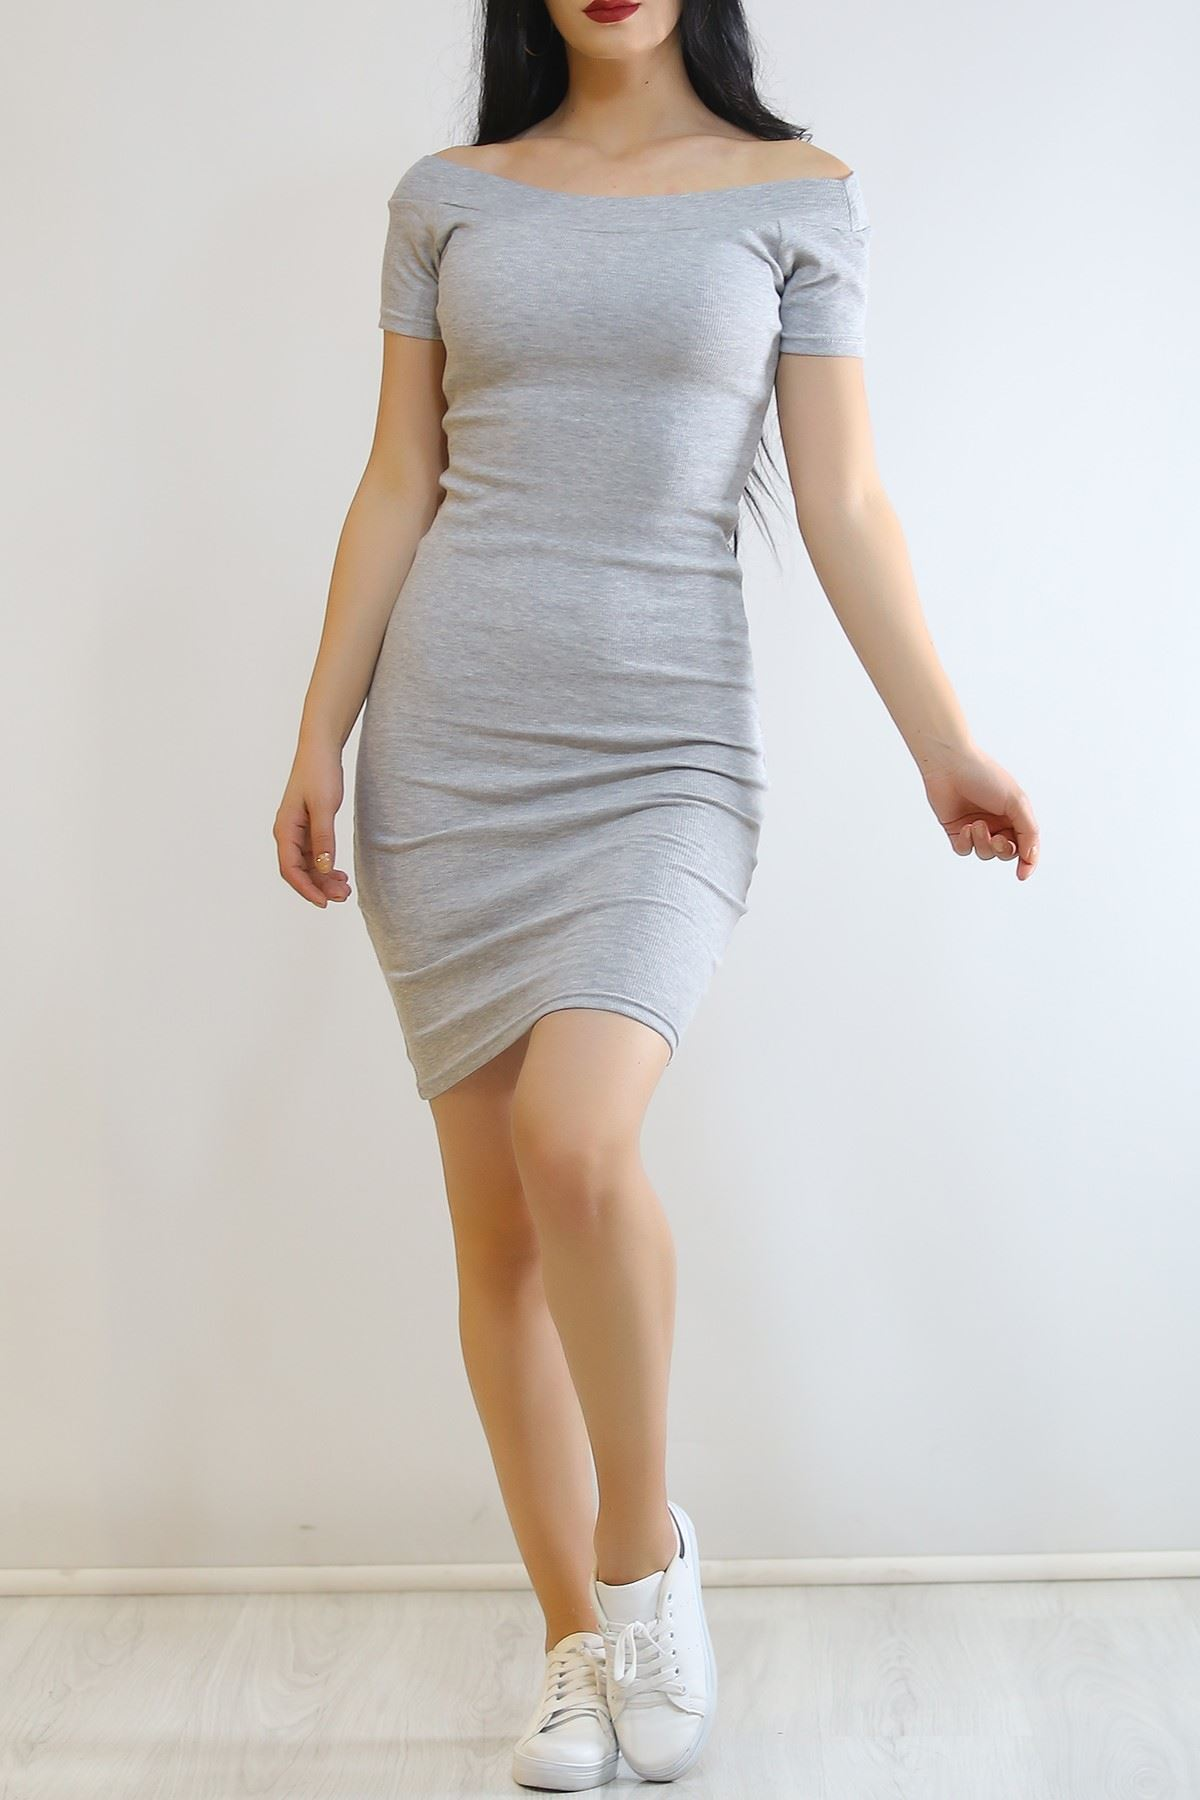 Madonna Elbise Gri - 6401.316.